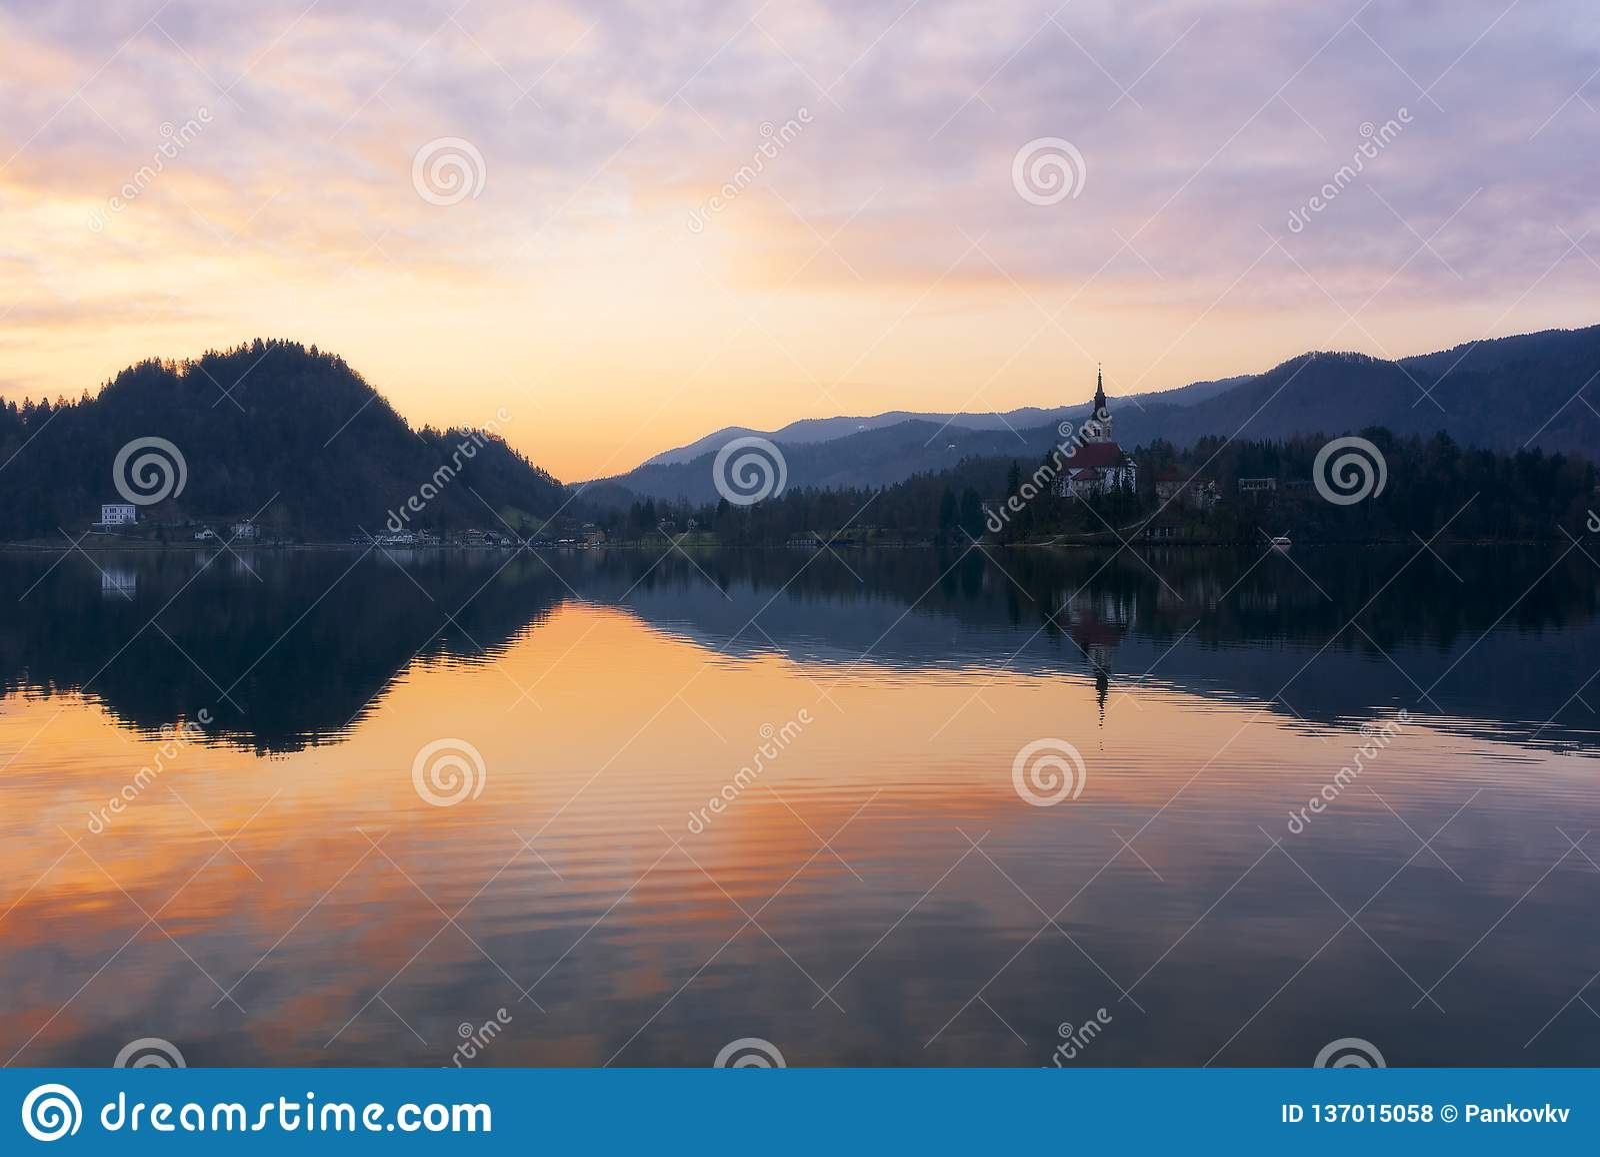 Mooie die zonsopgang en kerk op Meer in Slovenië bij de lente wordt afgetapt